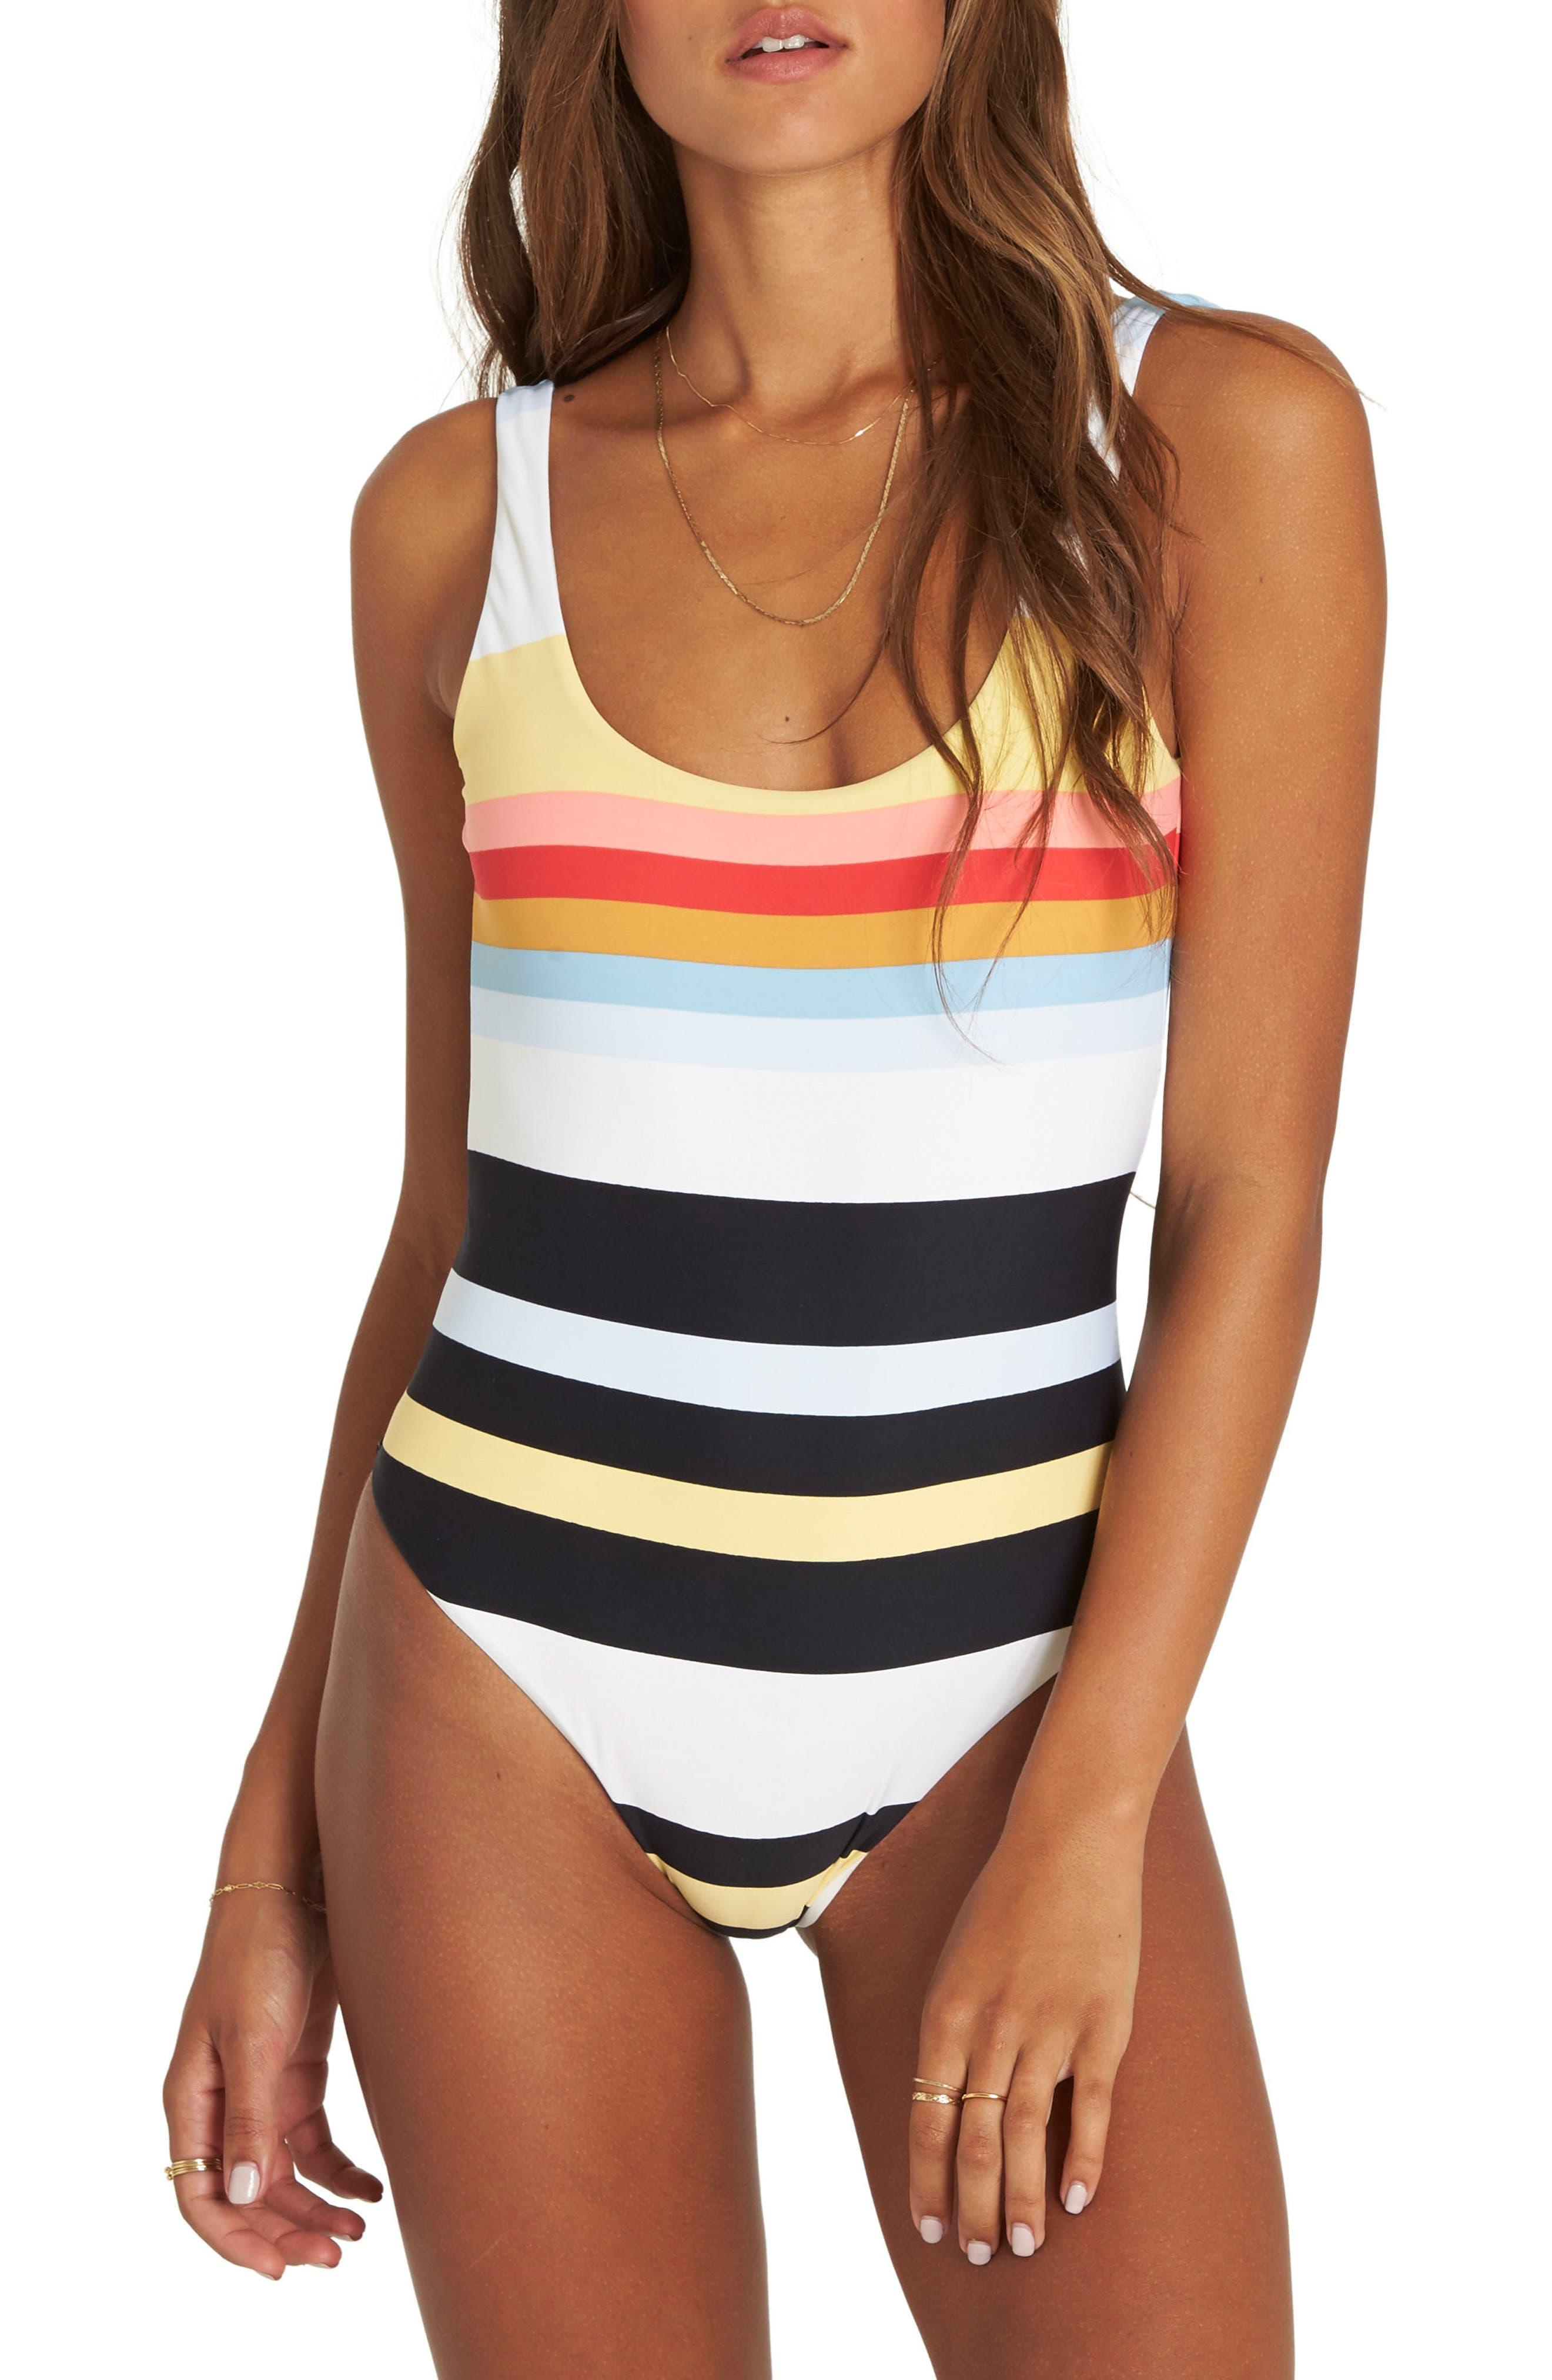 Baja Break One-Piece Swimsuit,                             Main thumbnail 1, color,                             White Multi